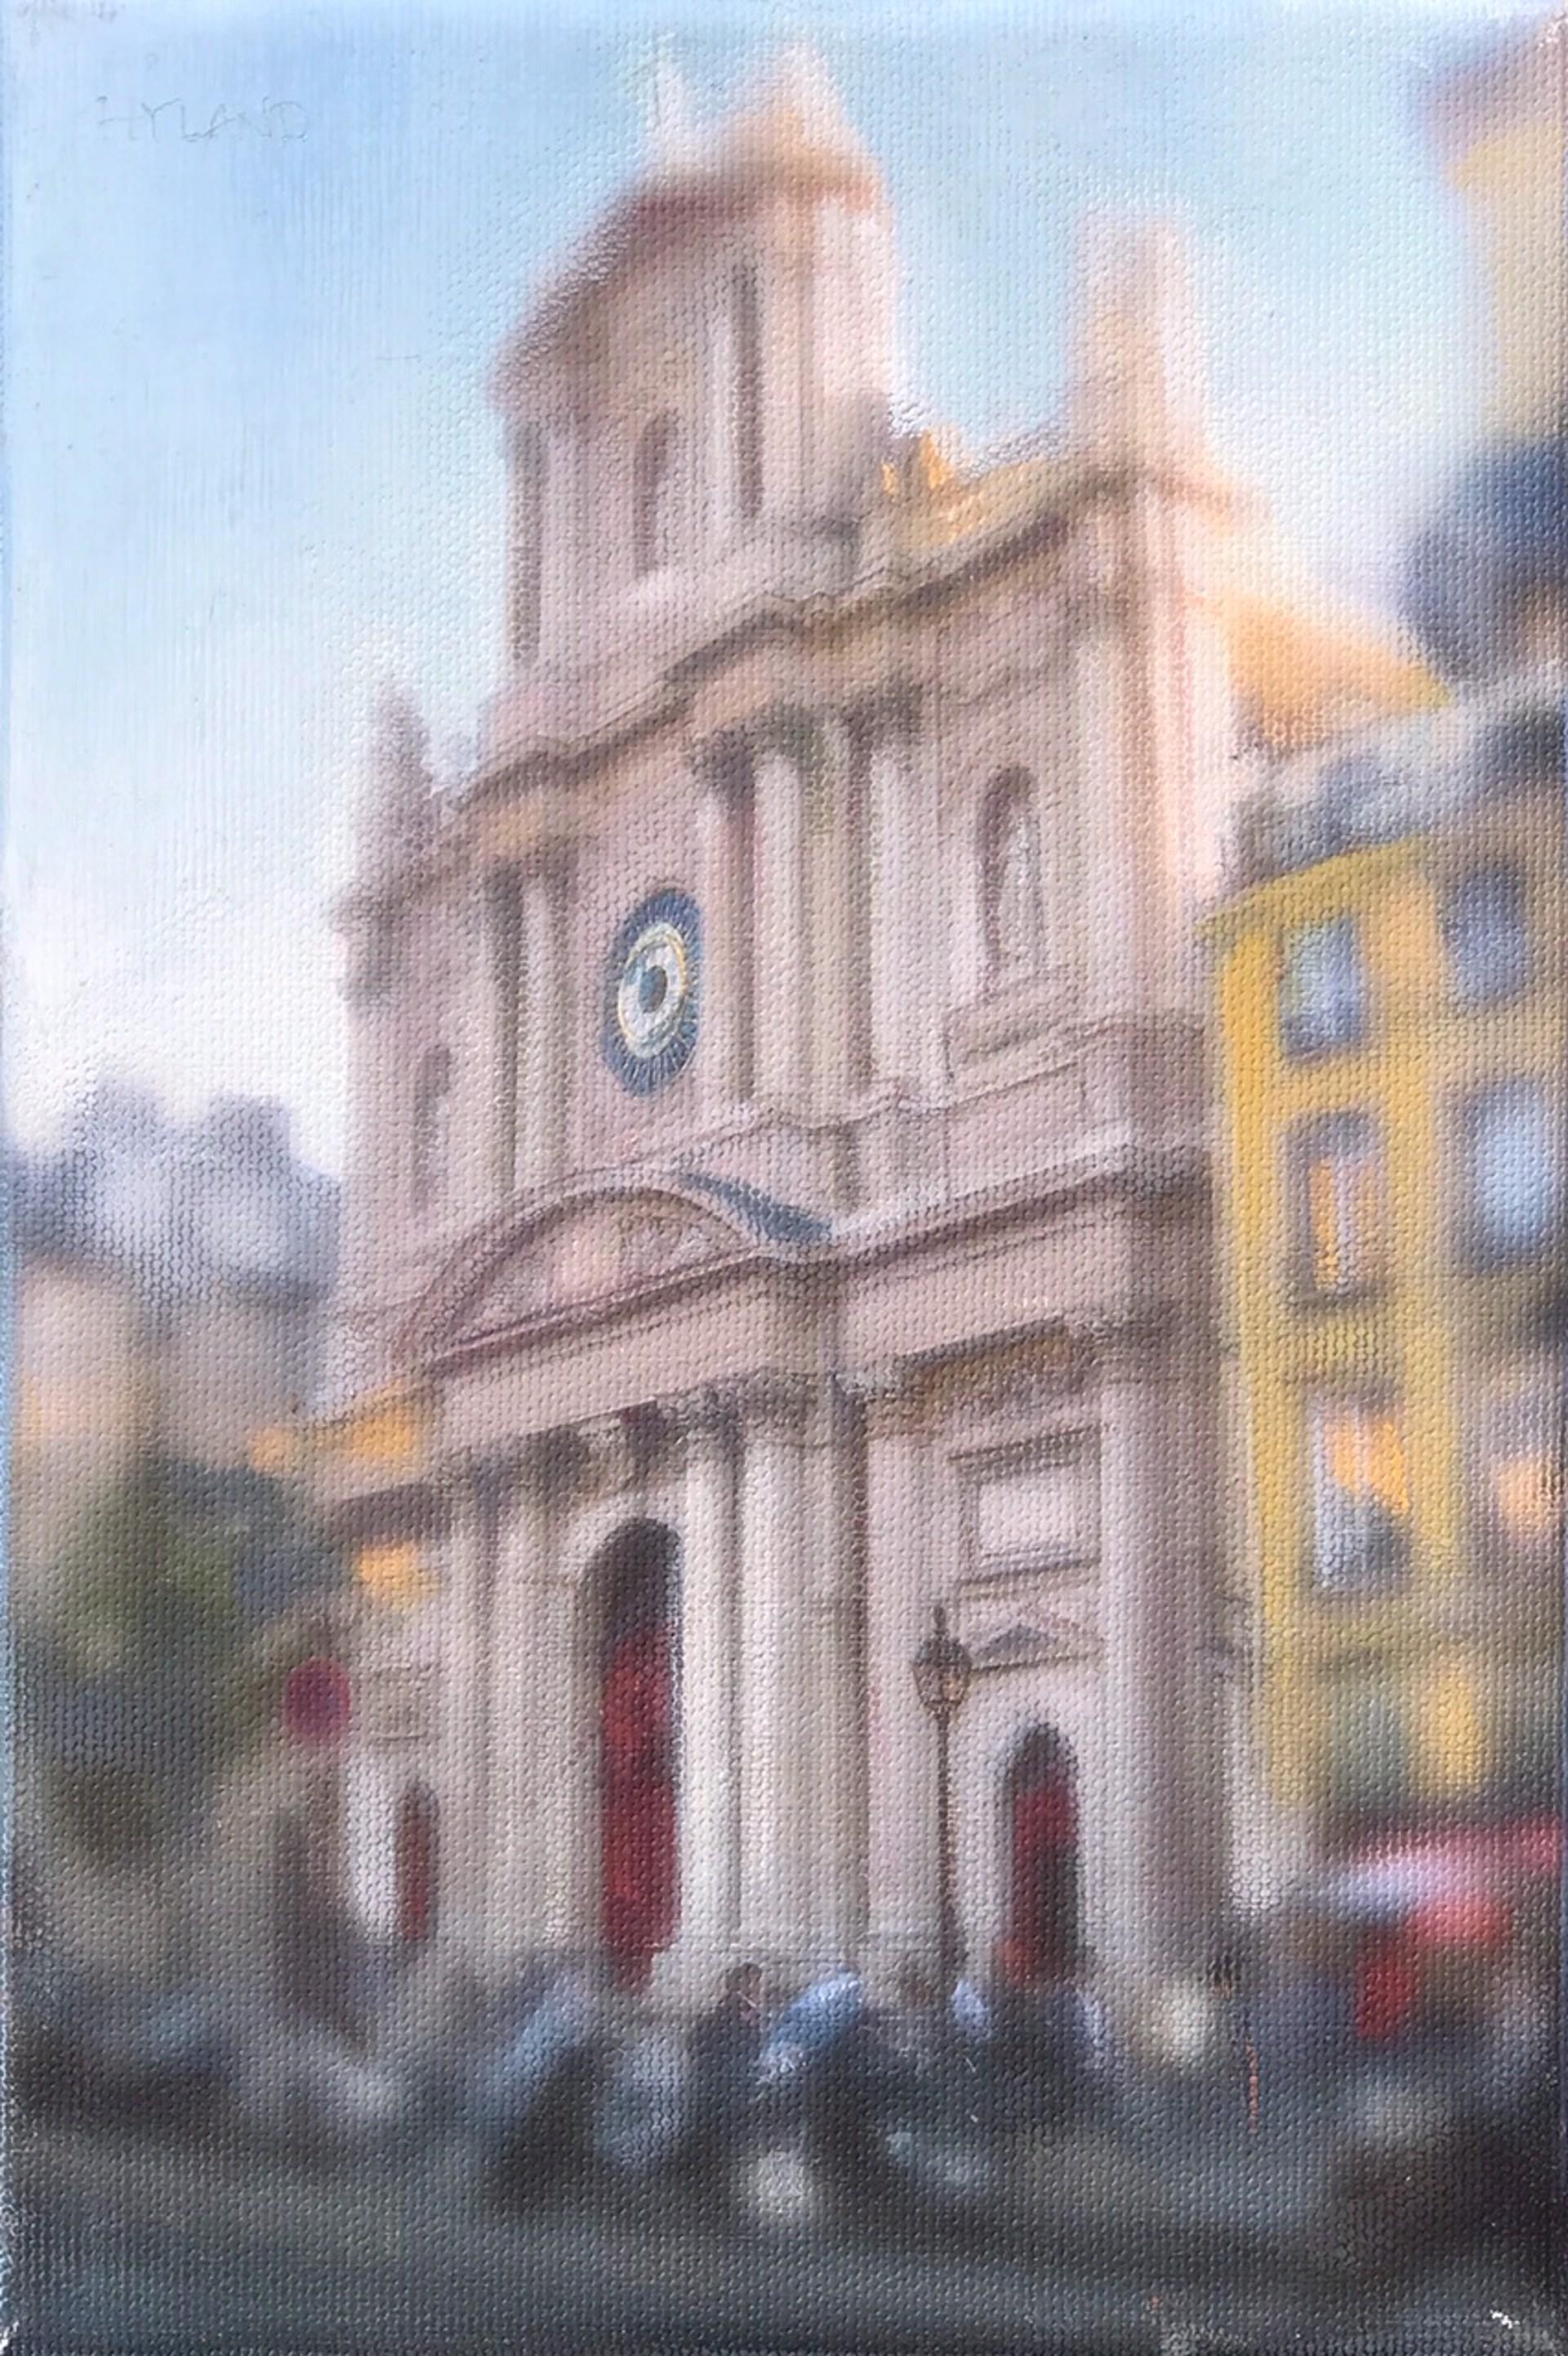 Heaven's Gate by John Hyland